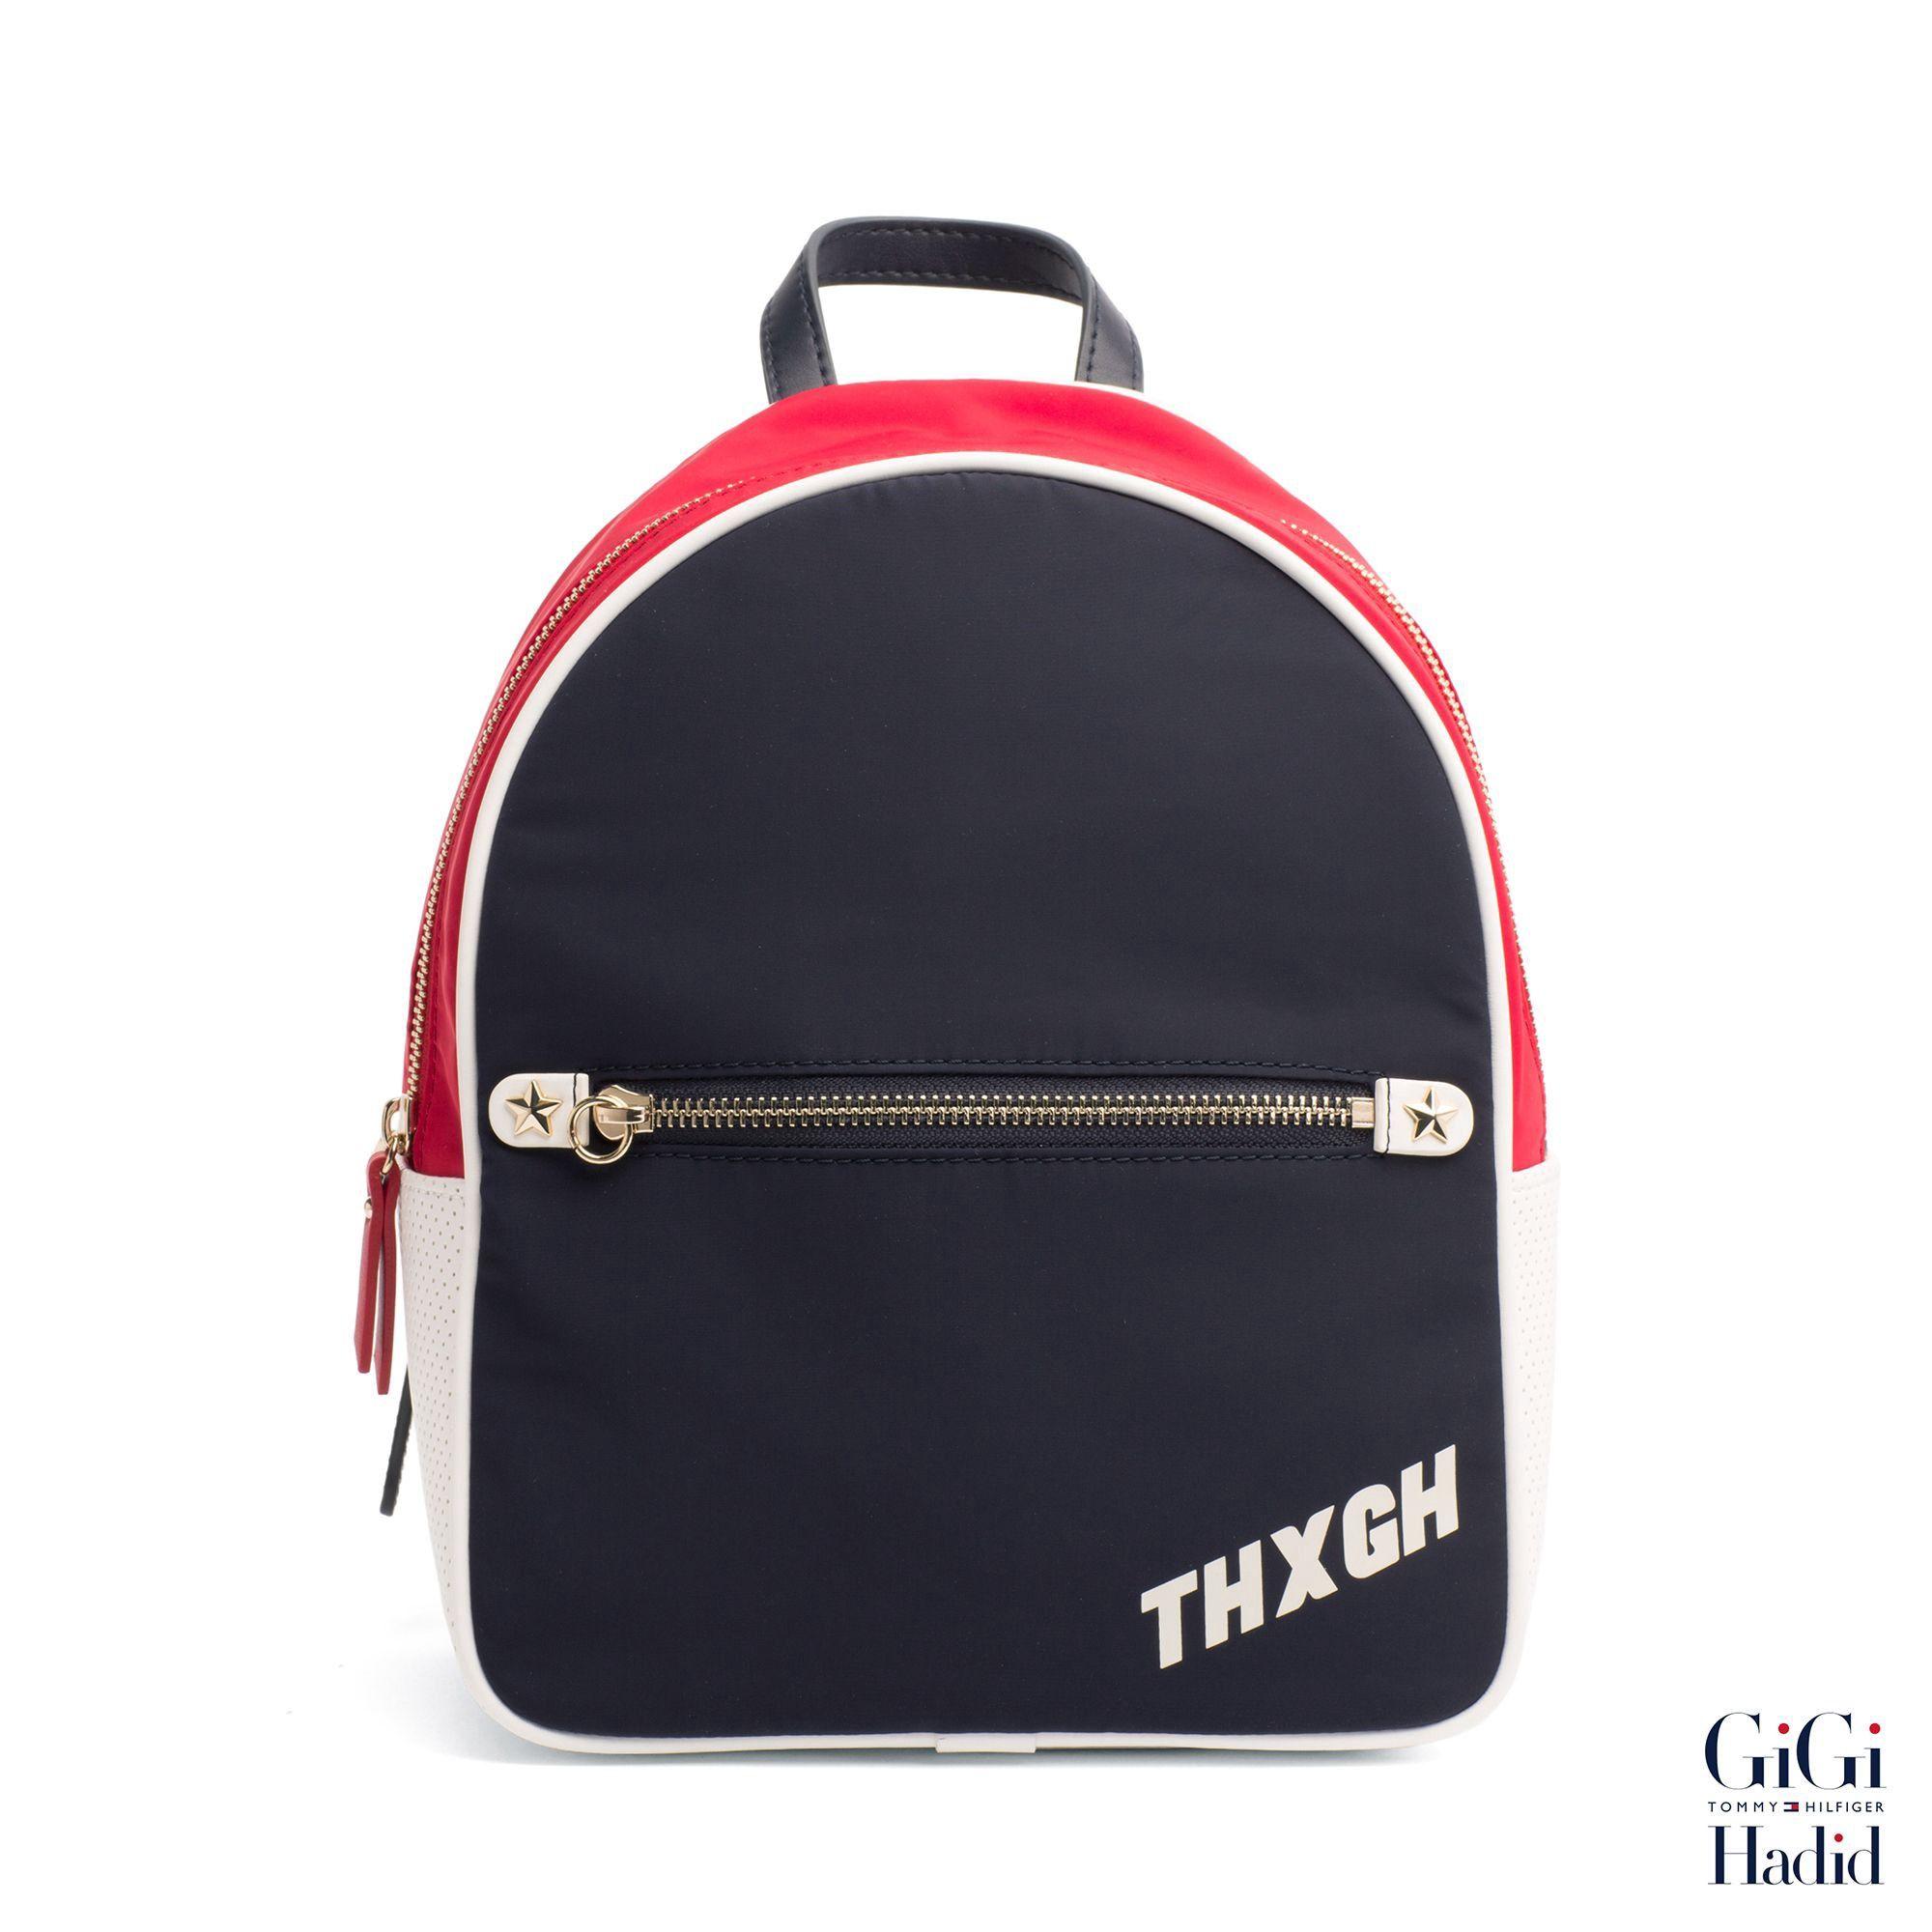 Tommy Hilfiger Gigi Hadid Mini Backpack noir à acheter en